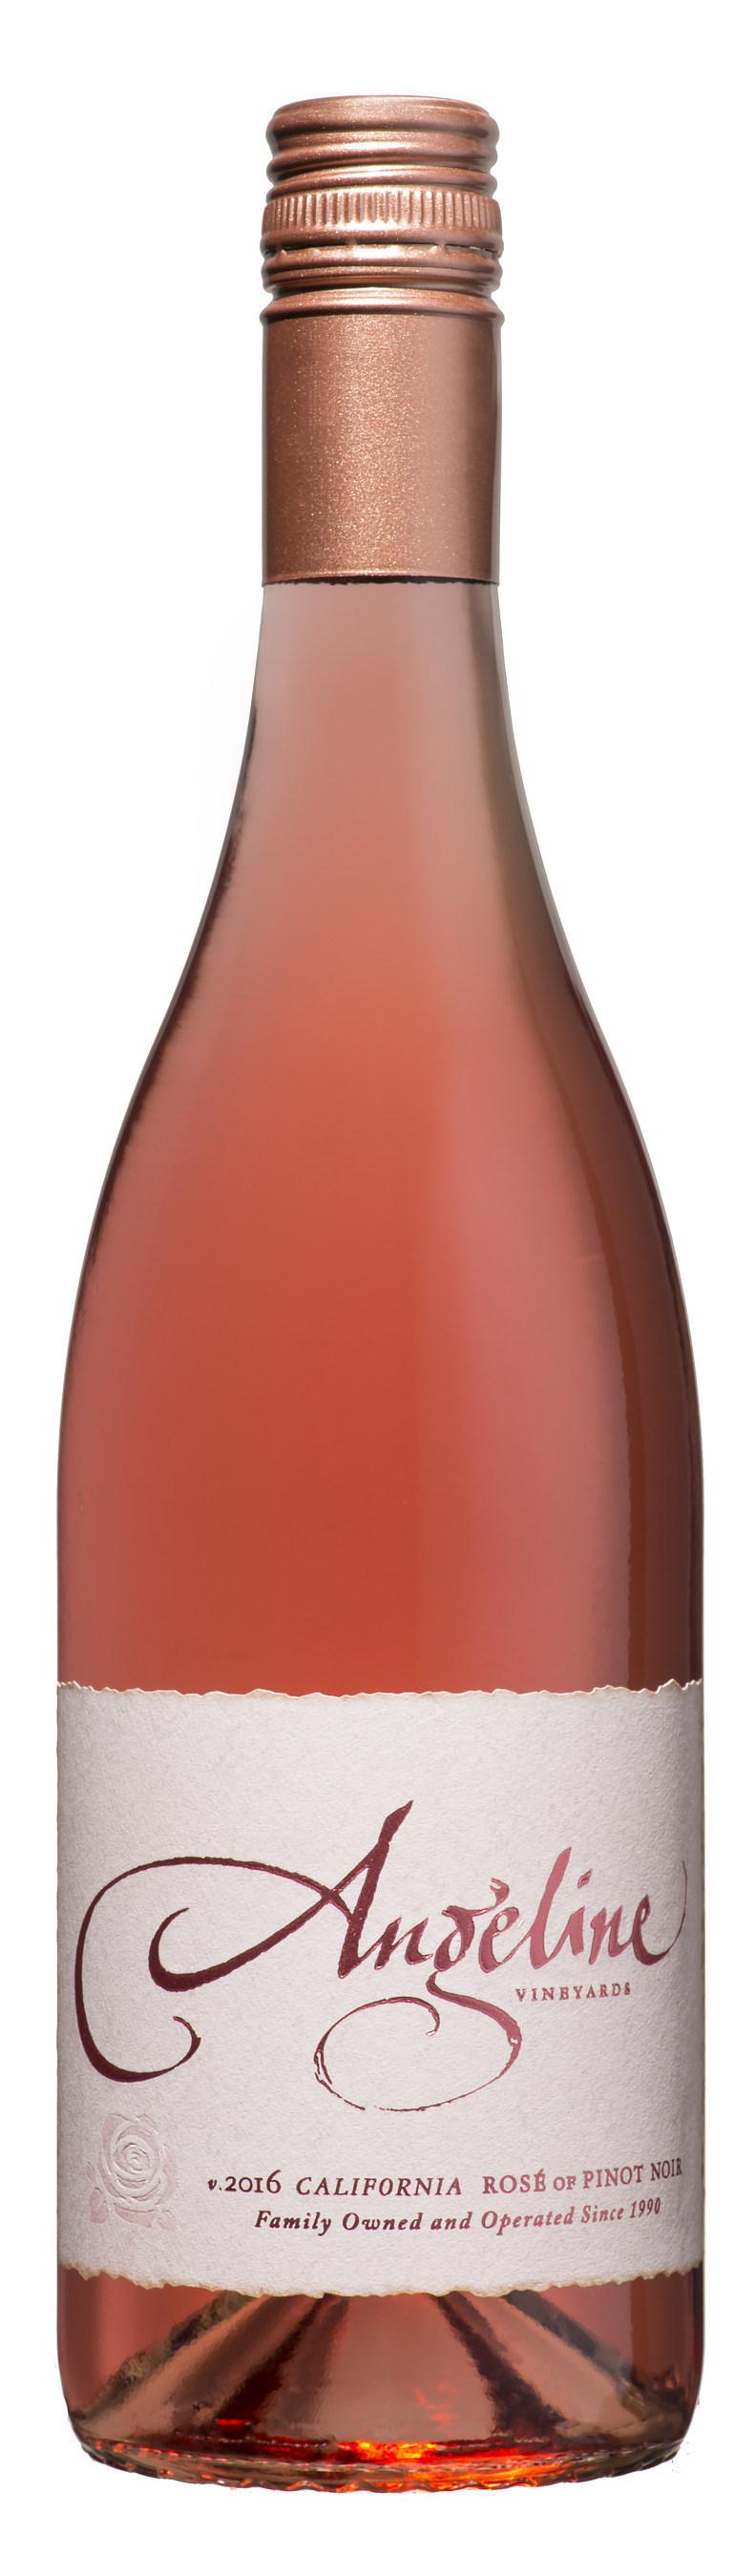 Angeline 2016 California Rose of Pinot Noir